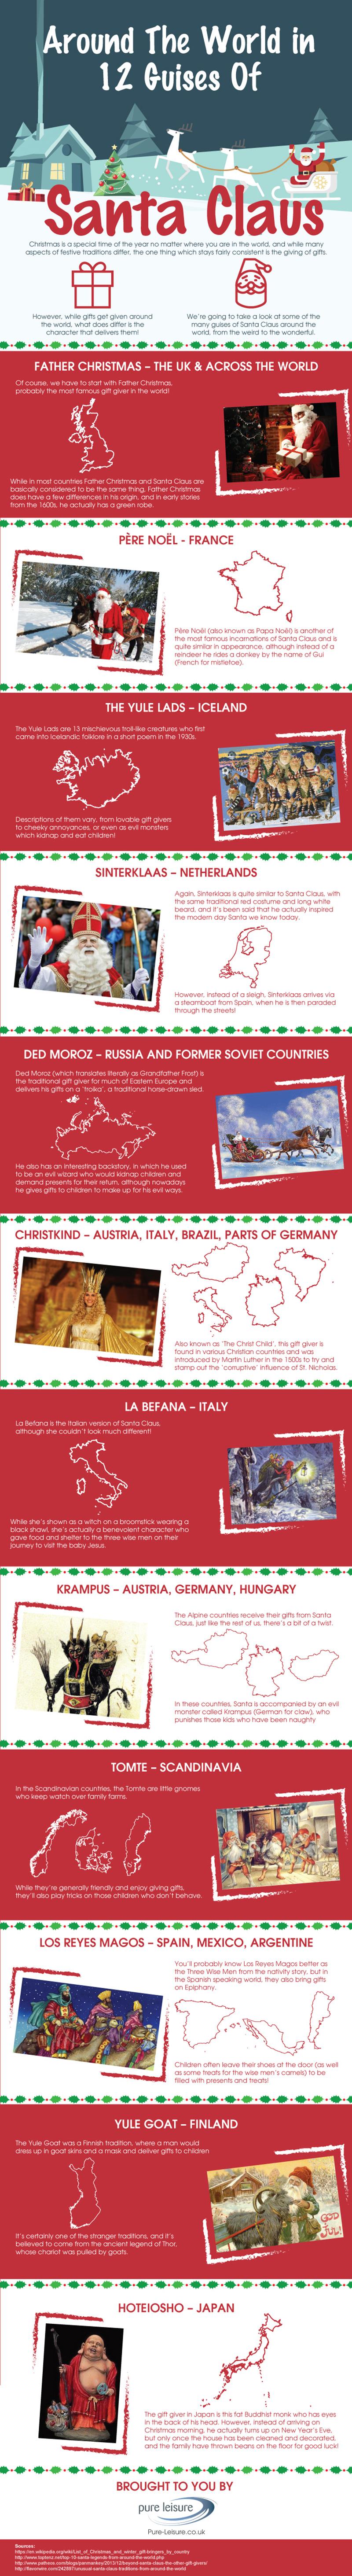 12 Guises Of Santa Claus